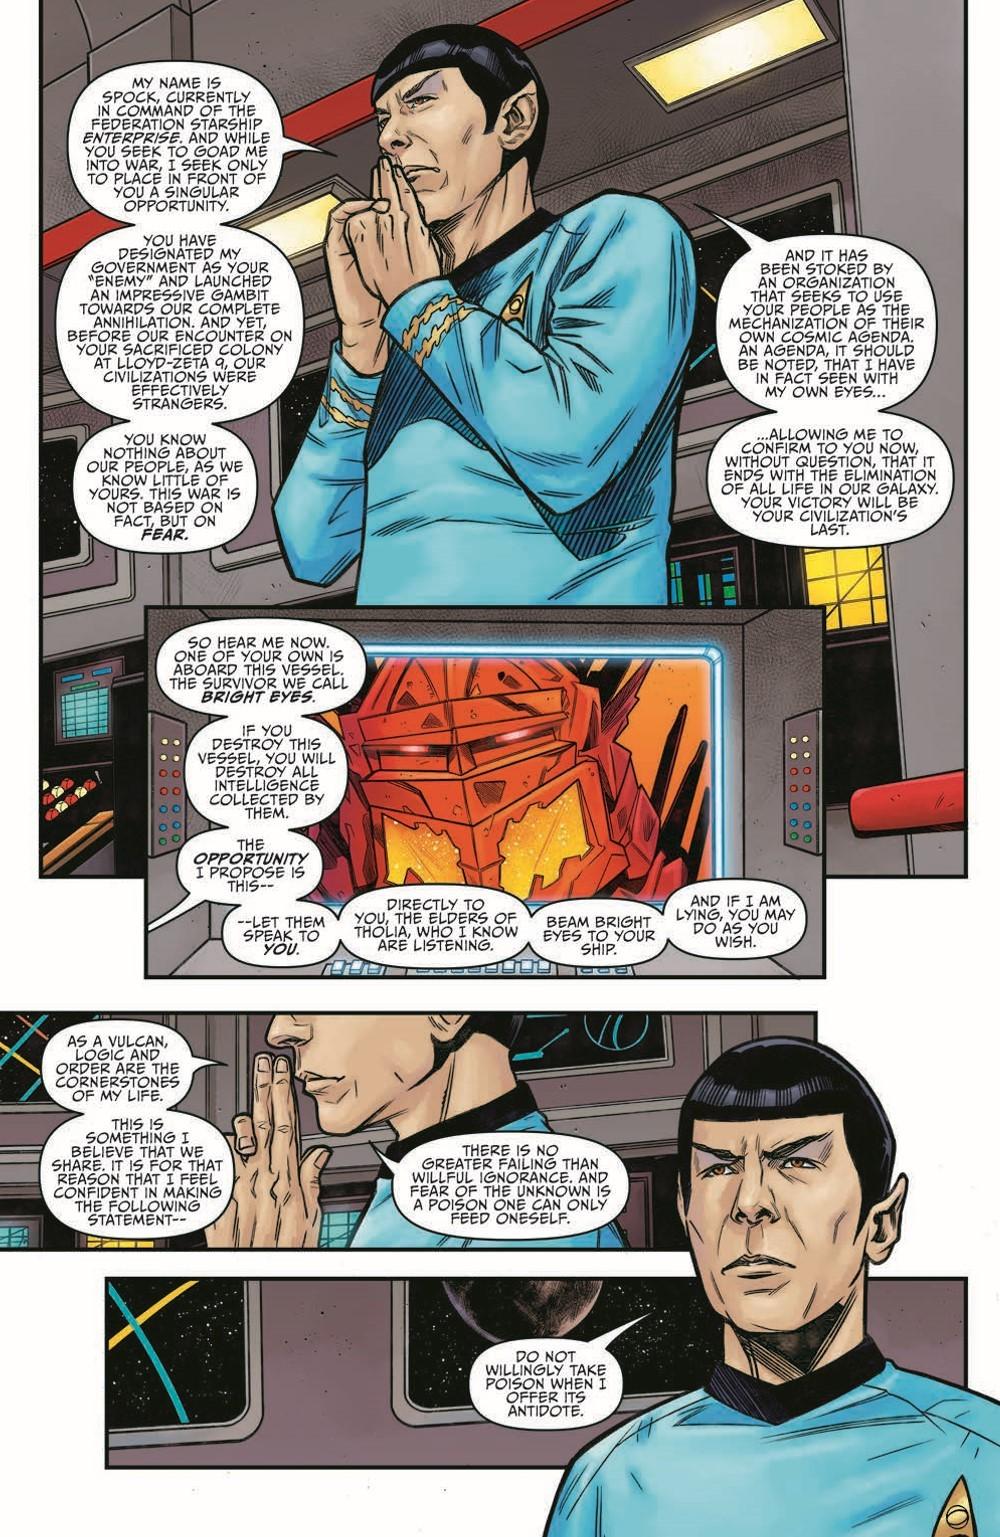 ST_YearFive24-pr-7 ComicList Previews: STAR TREK YEAR FIVE #24